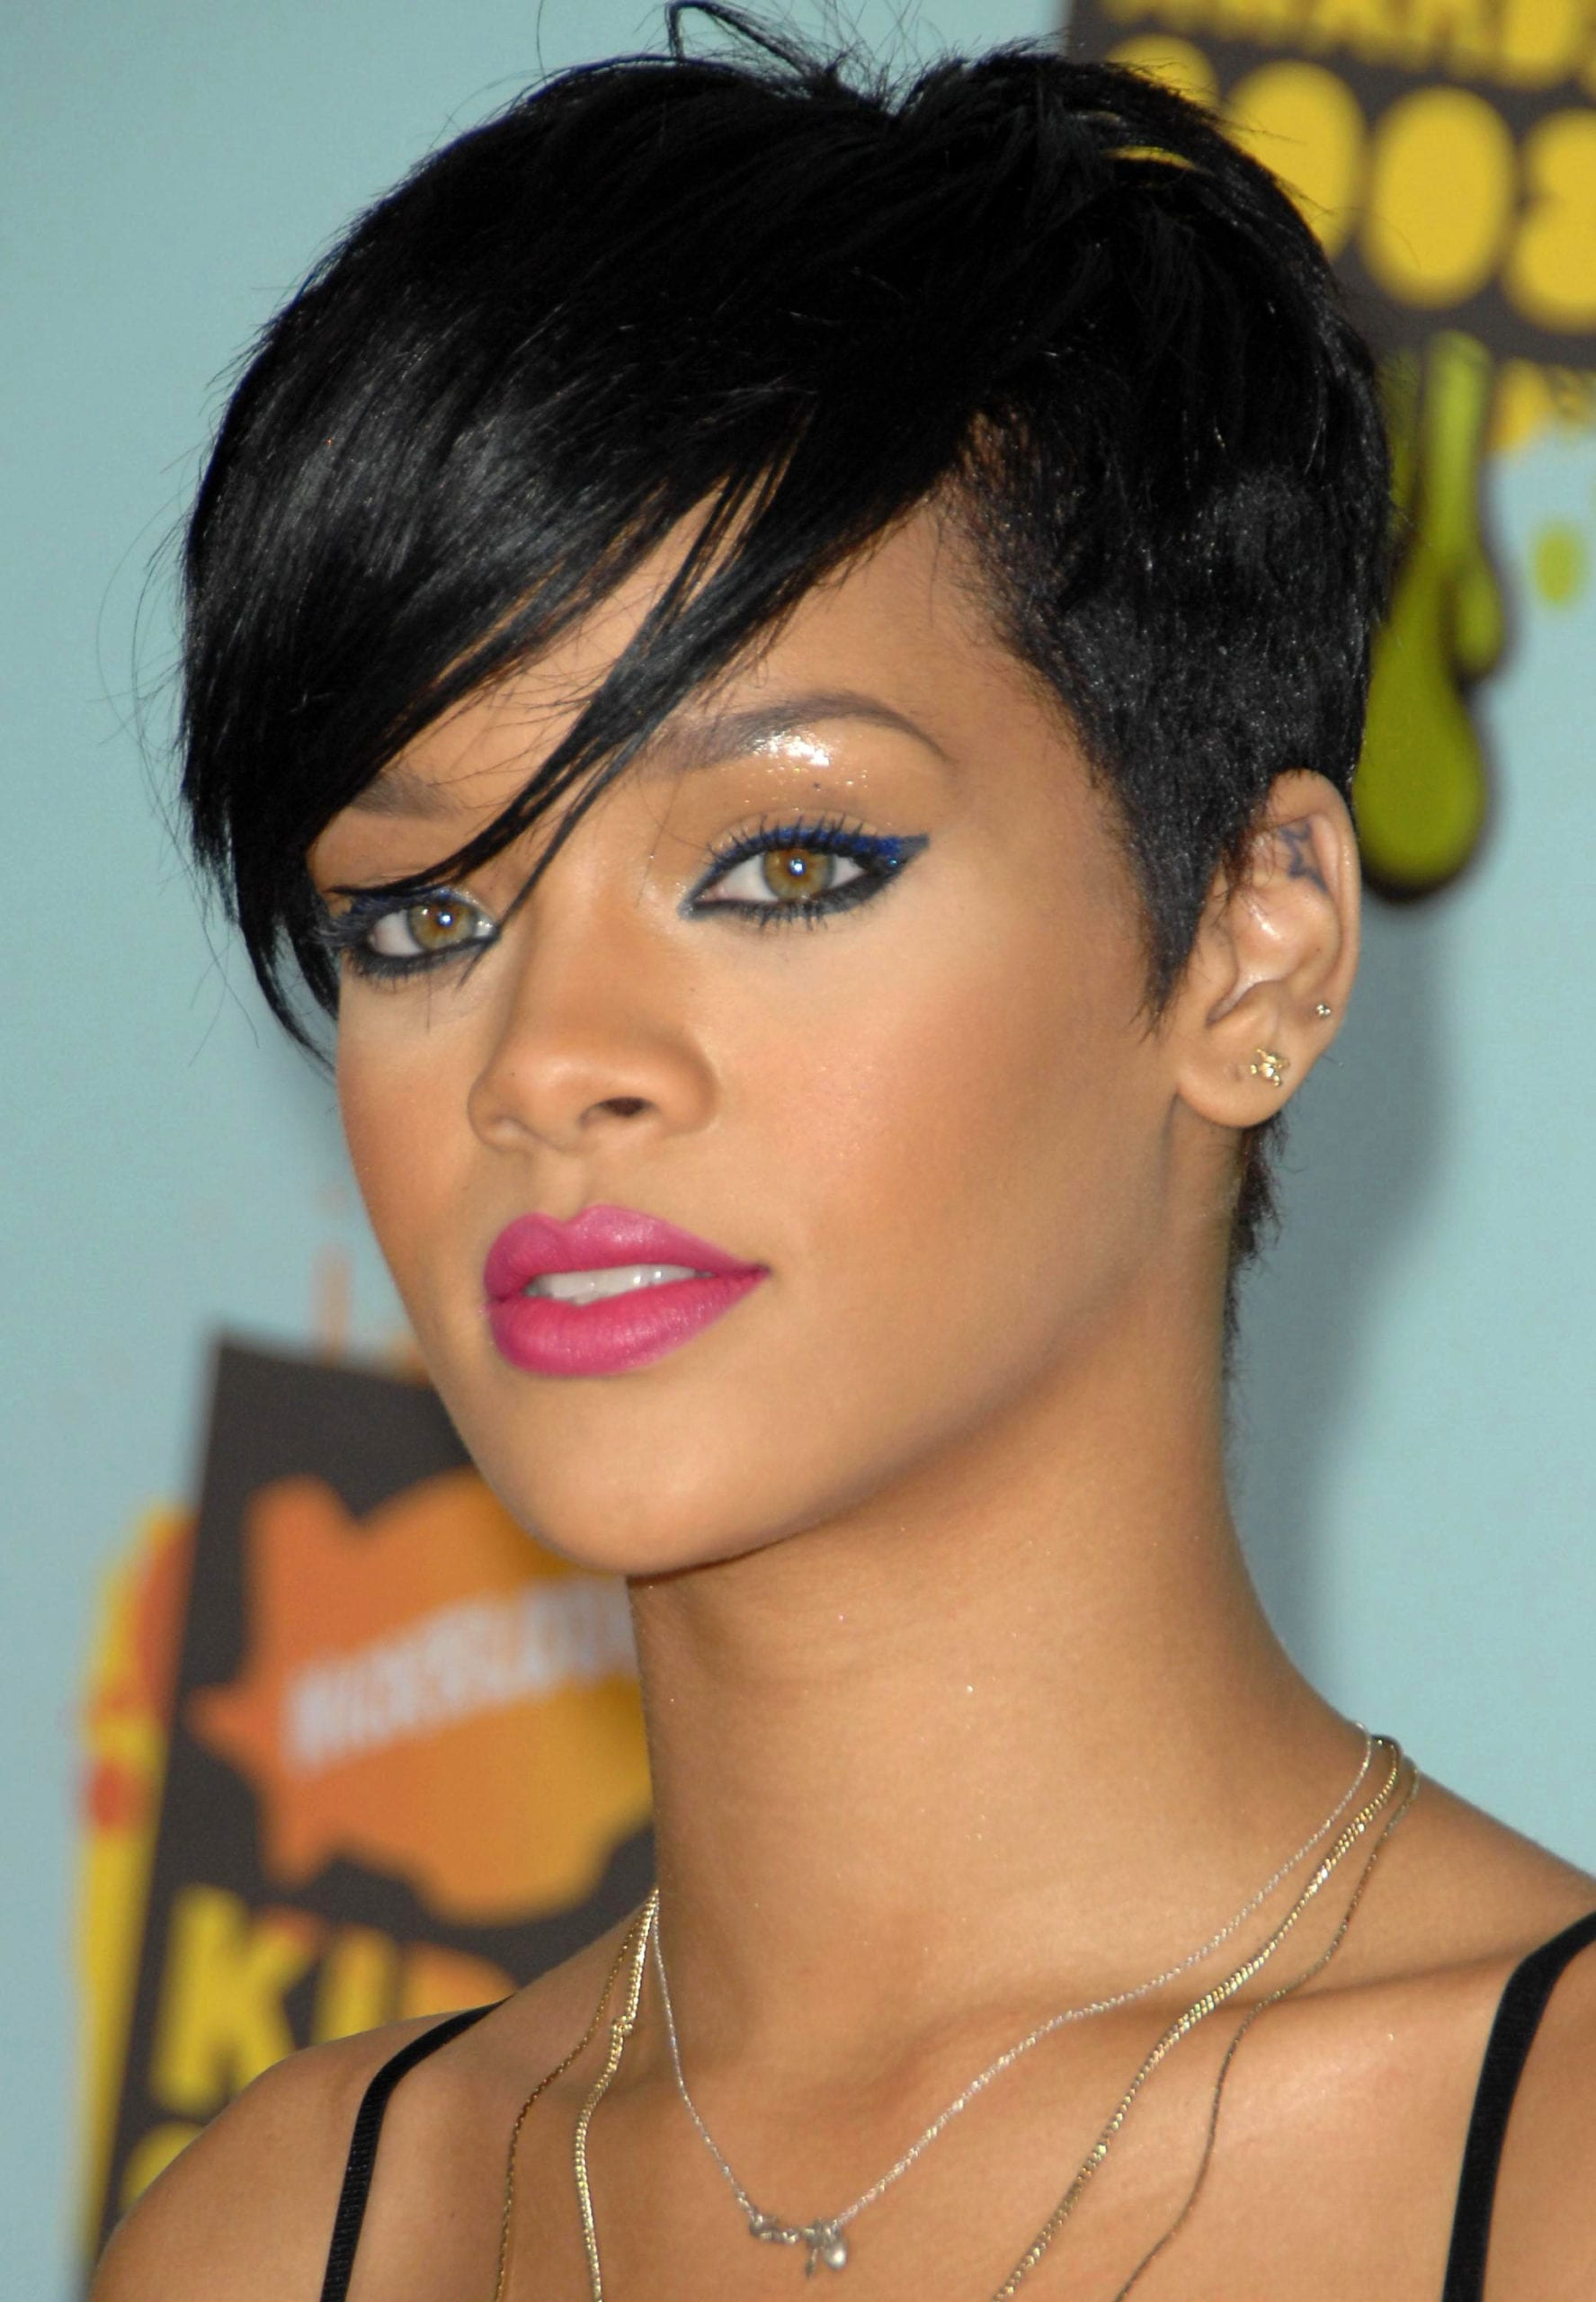 Rihanna's Tapered Pixie